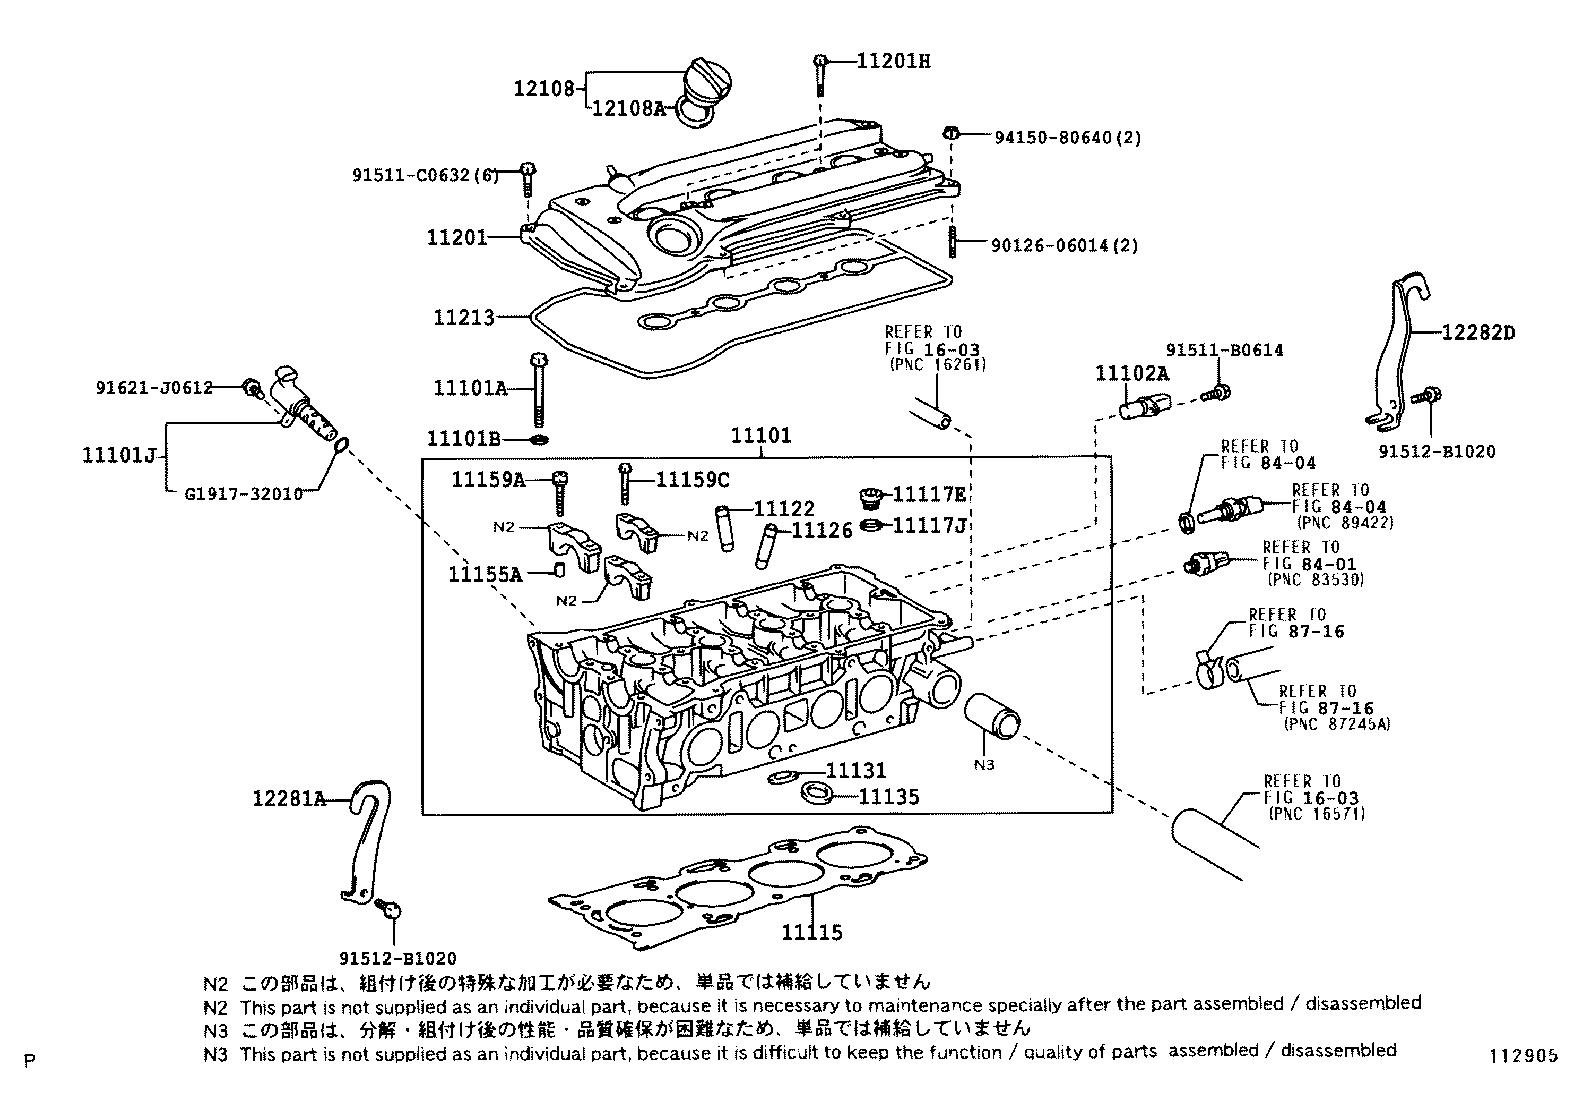 toyota rav4aca20l-azmnk - tool-engine-fuel